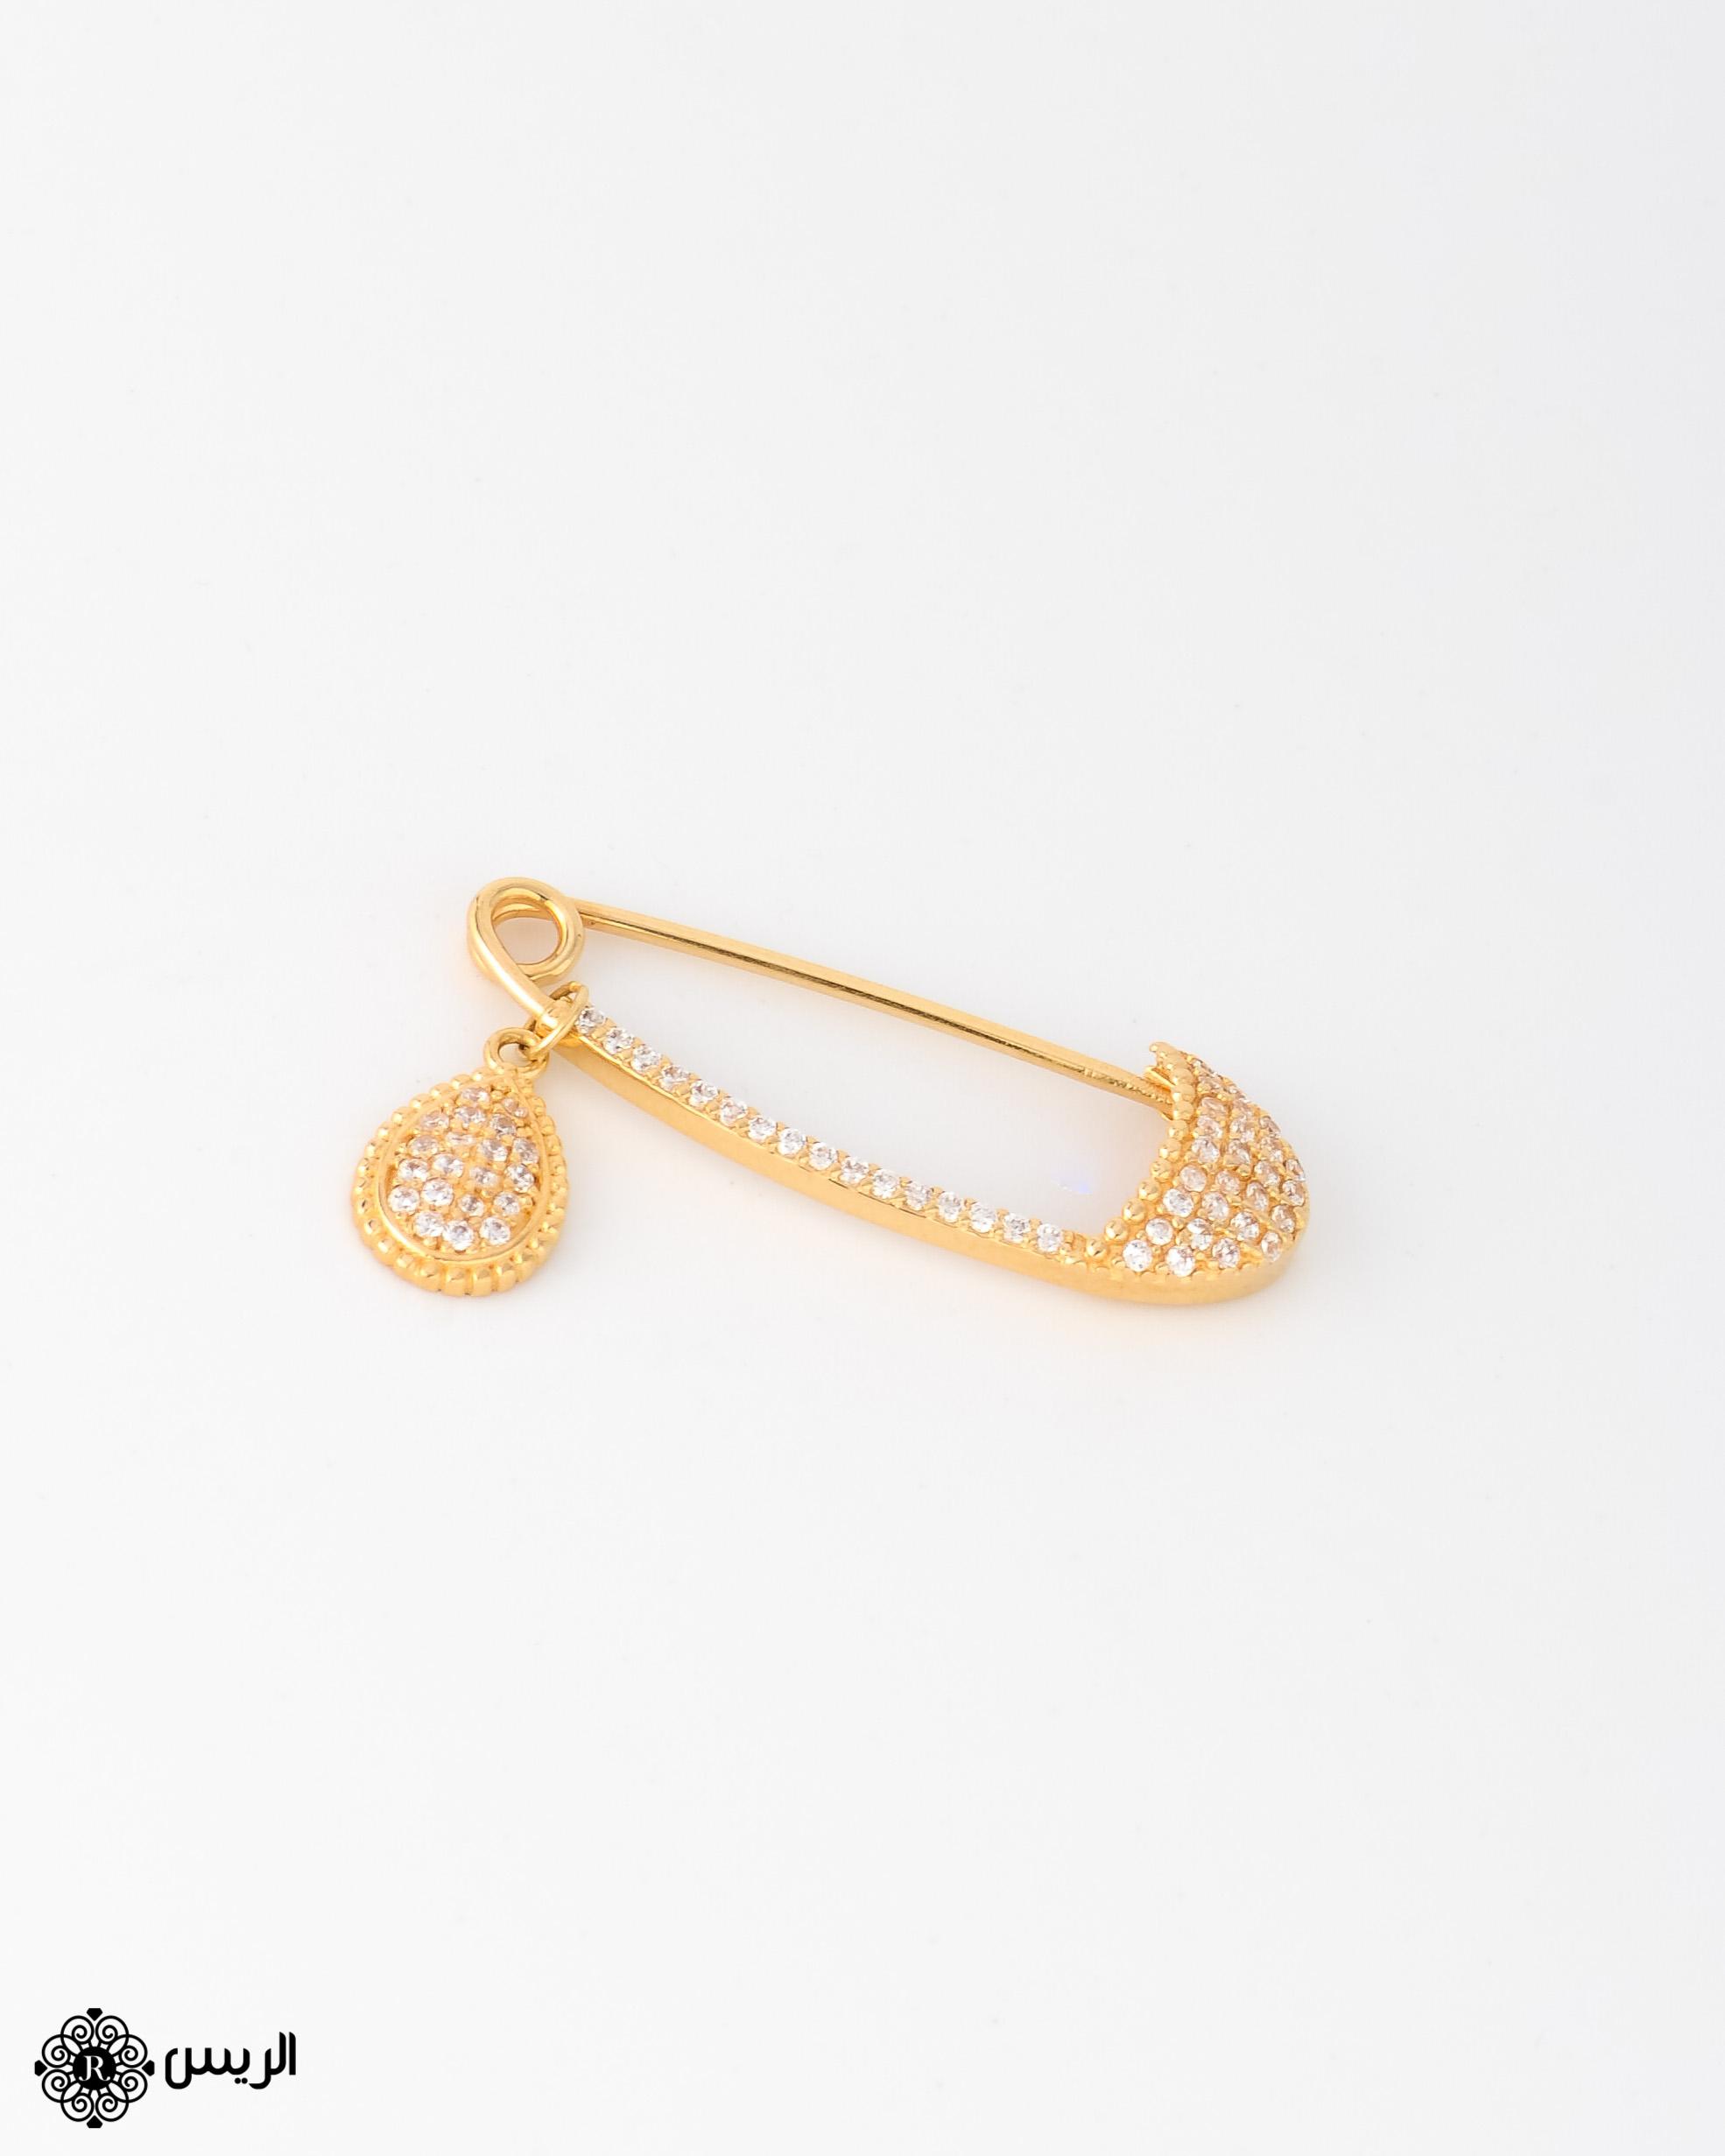 Raies jewelry Baby Brooch بروش أطفال الريس للمجوهرات